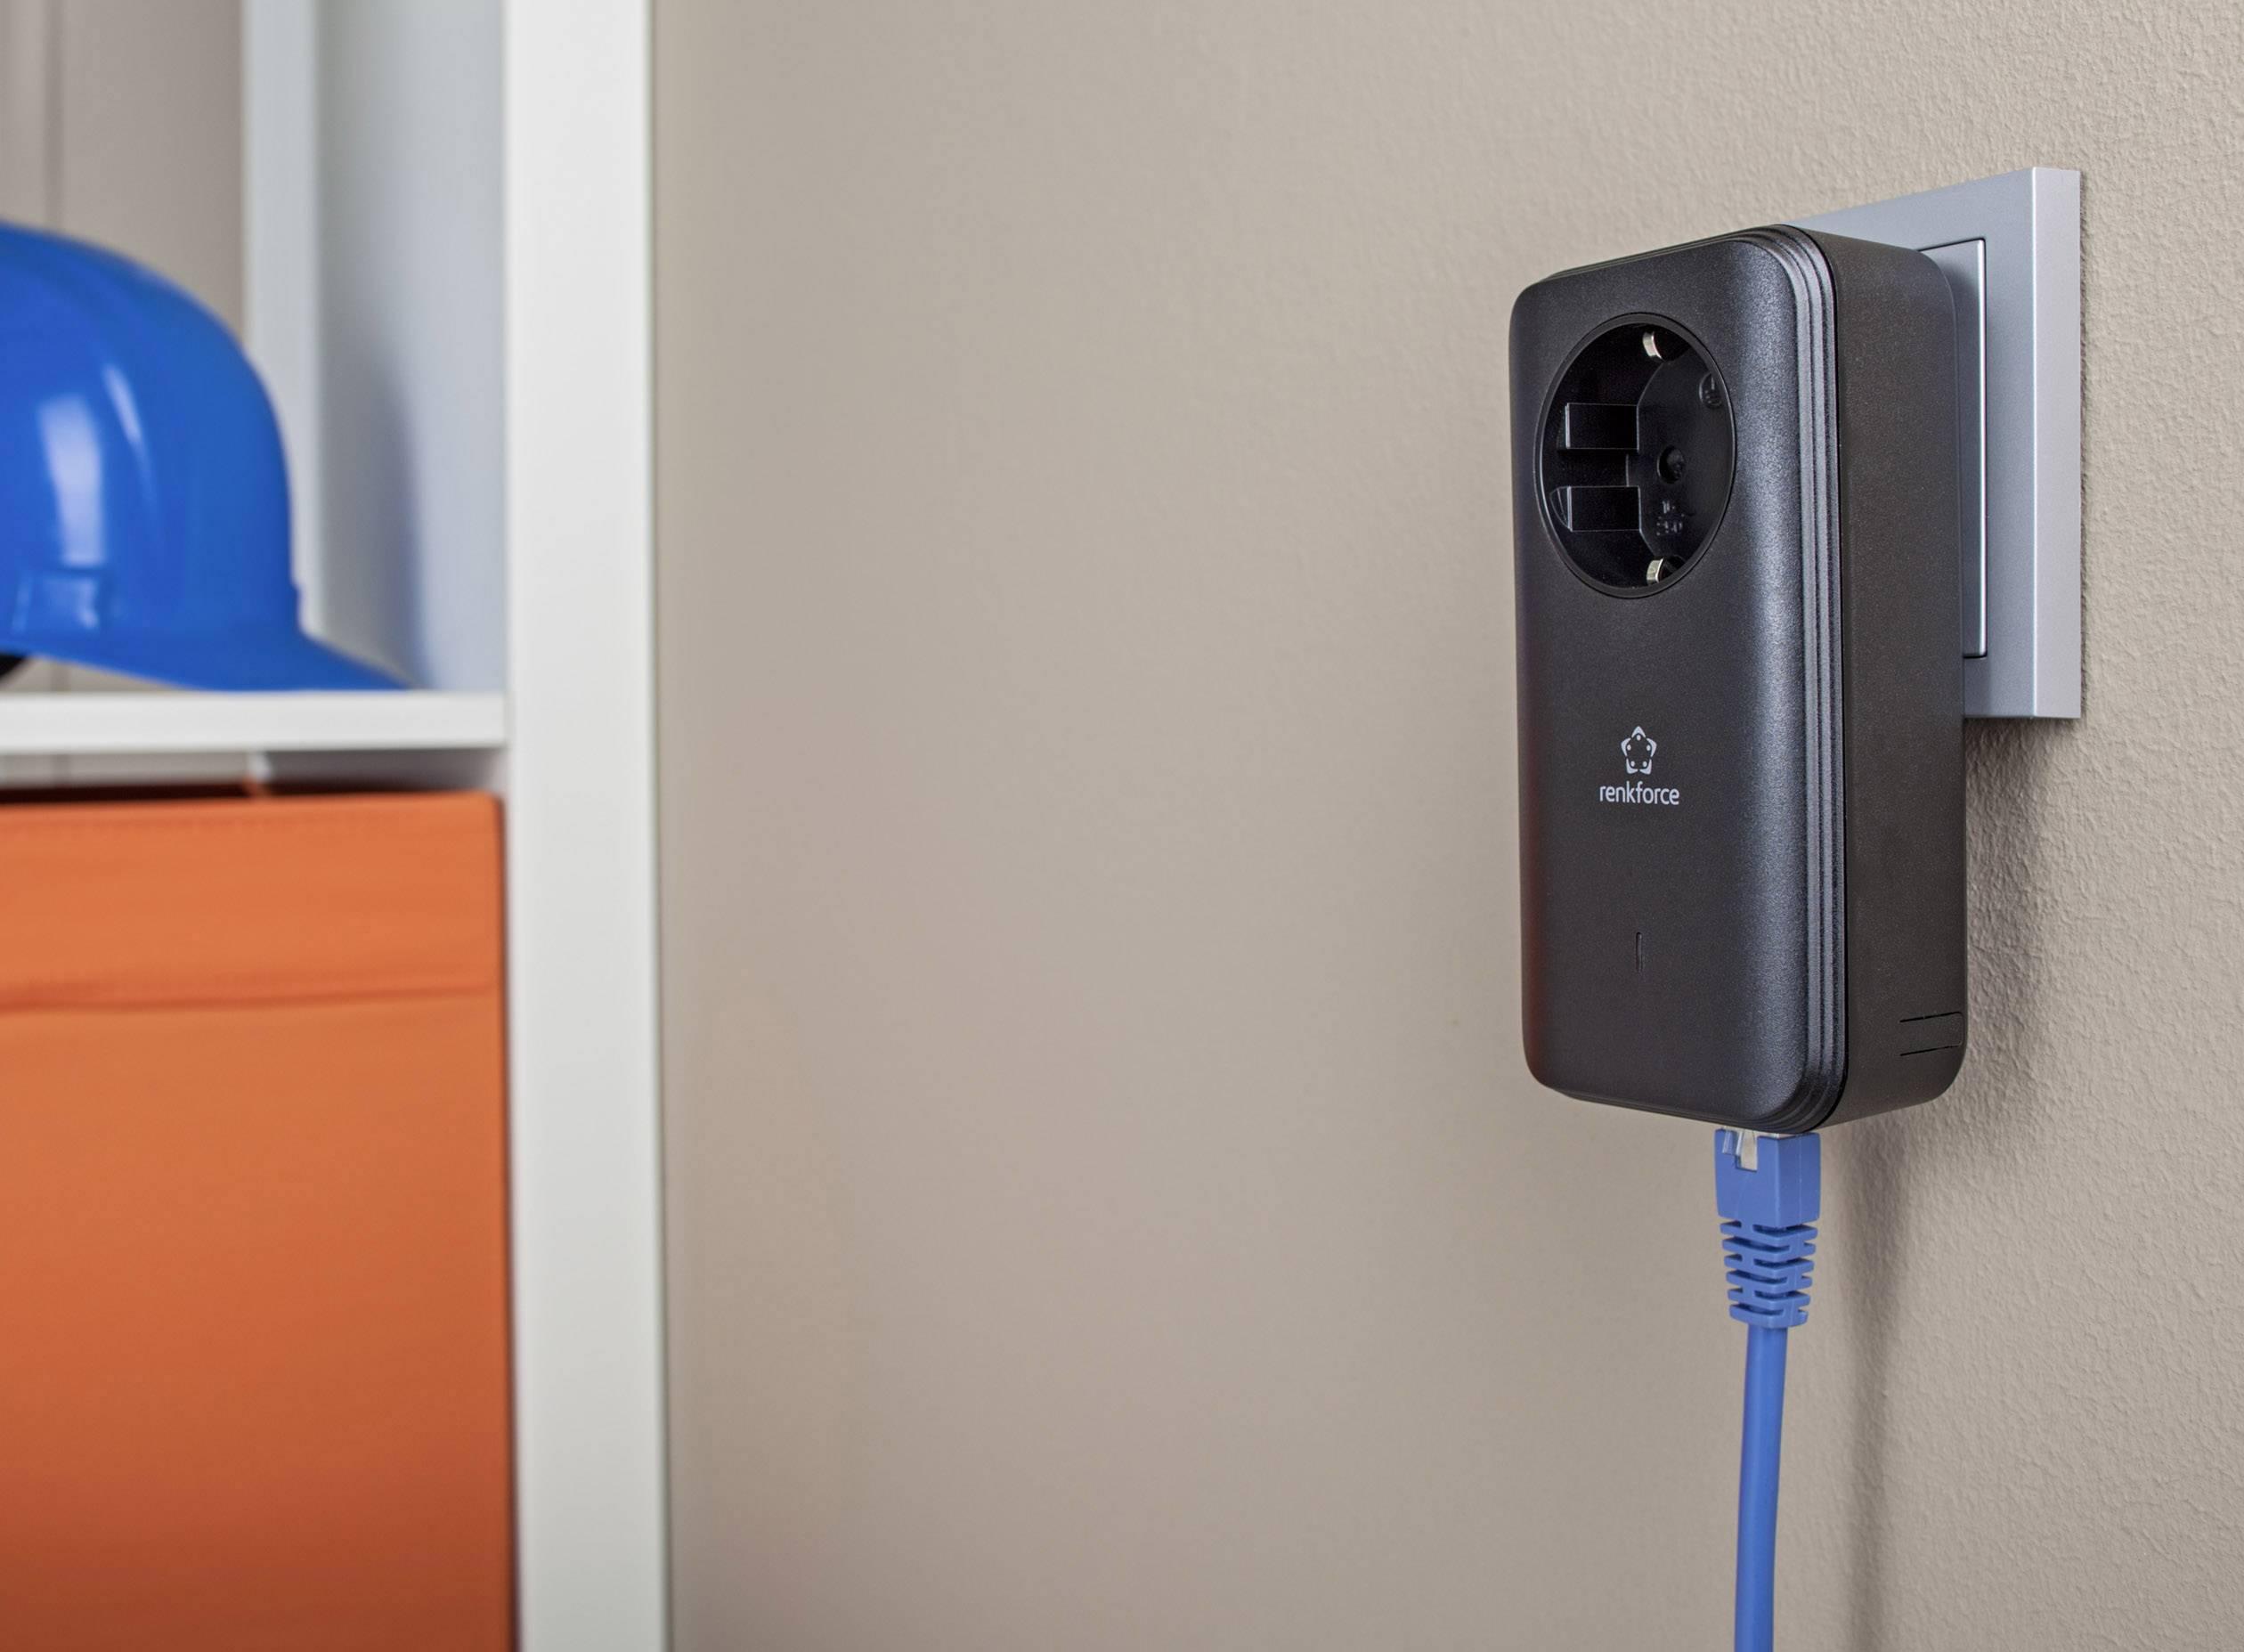 Allnet ALL1681205DOUBLE Powerline starterkit 1 2 Gbit/s